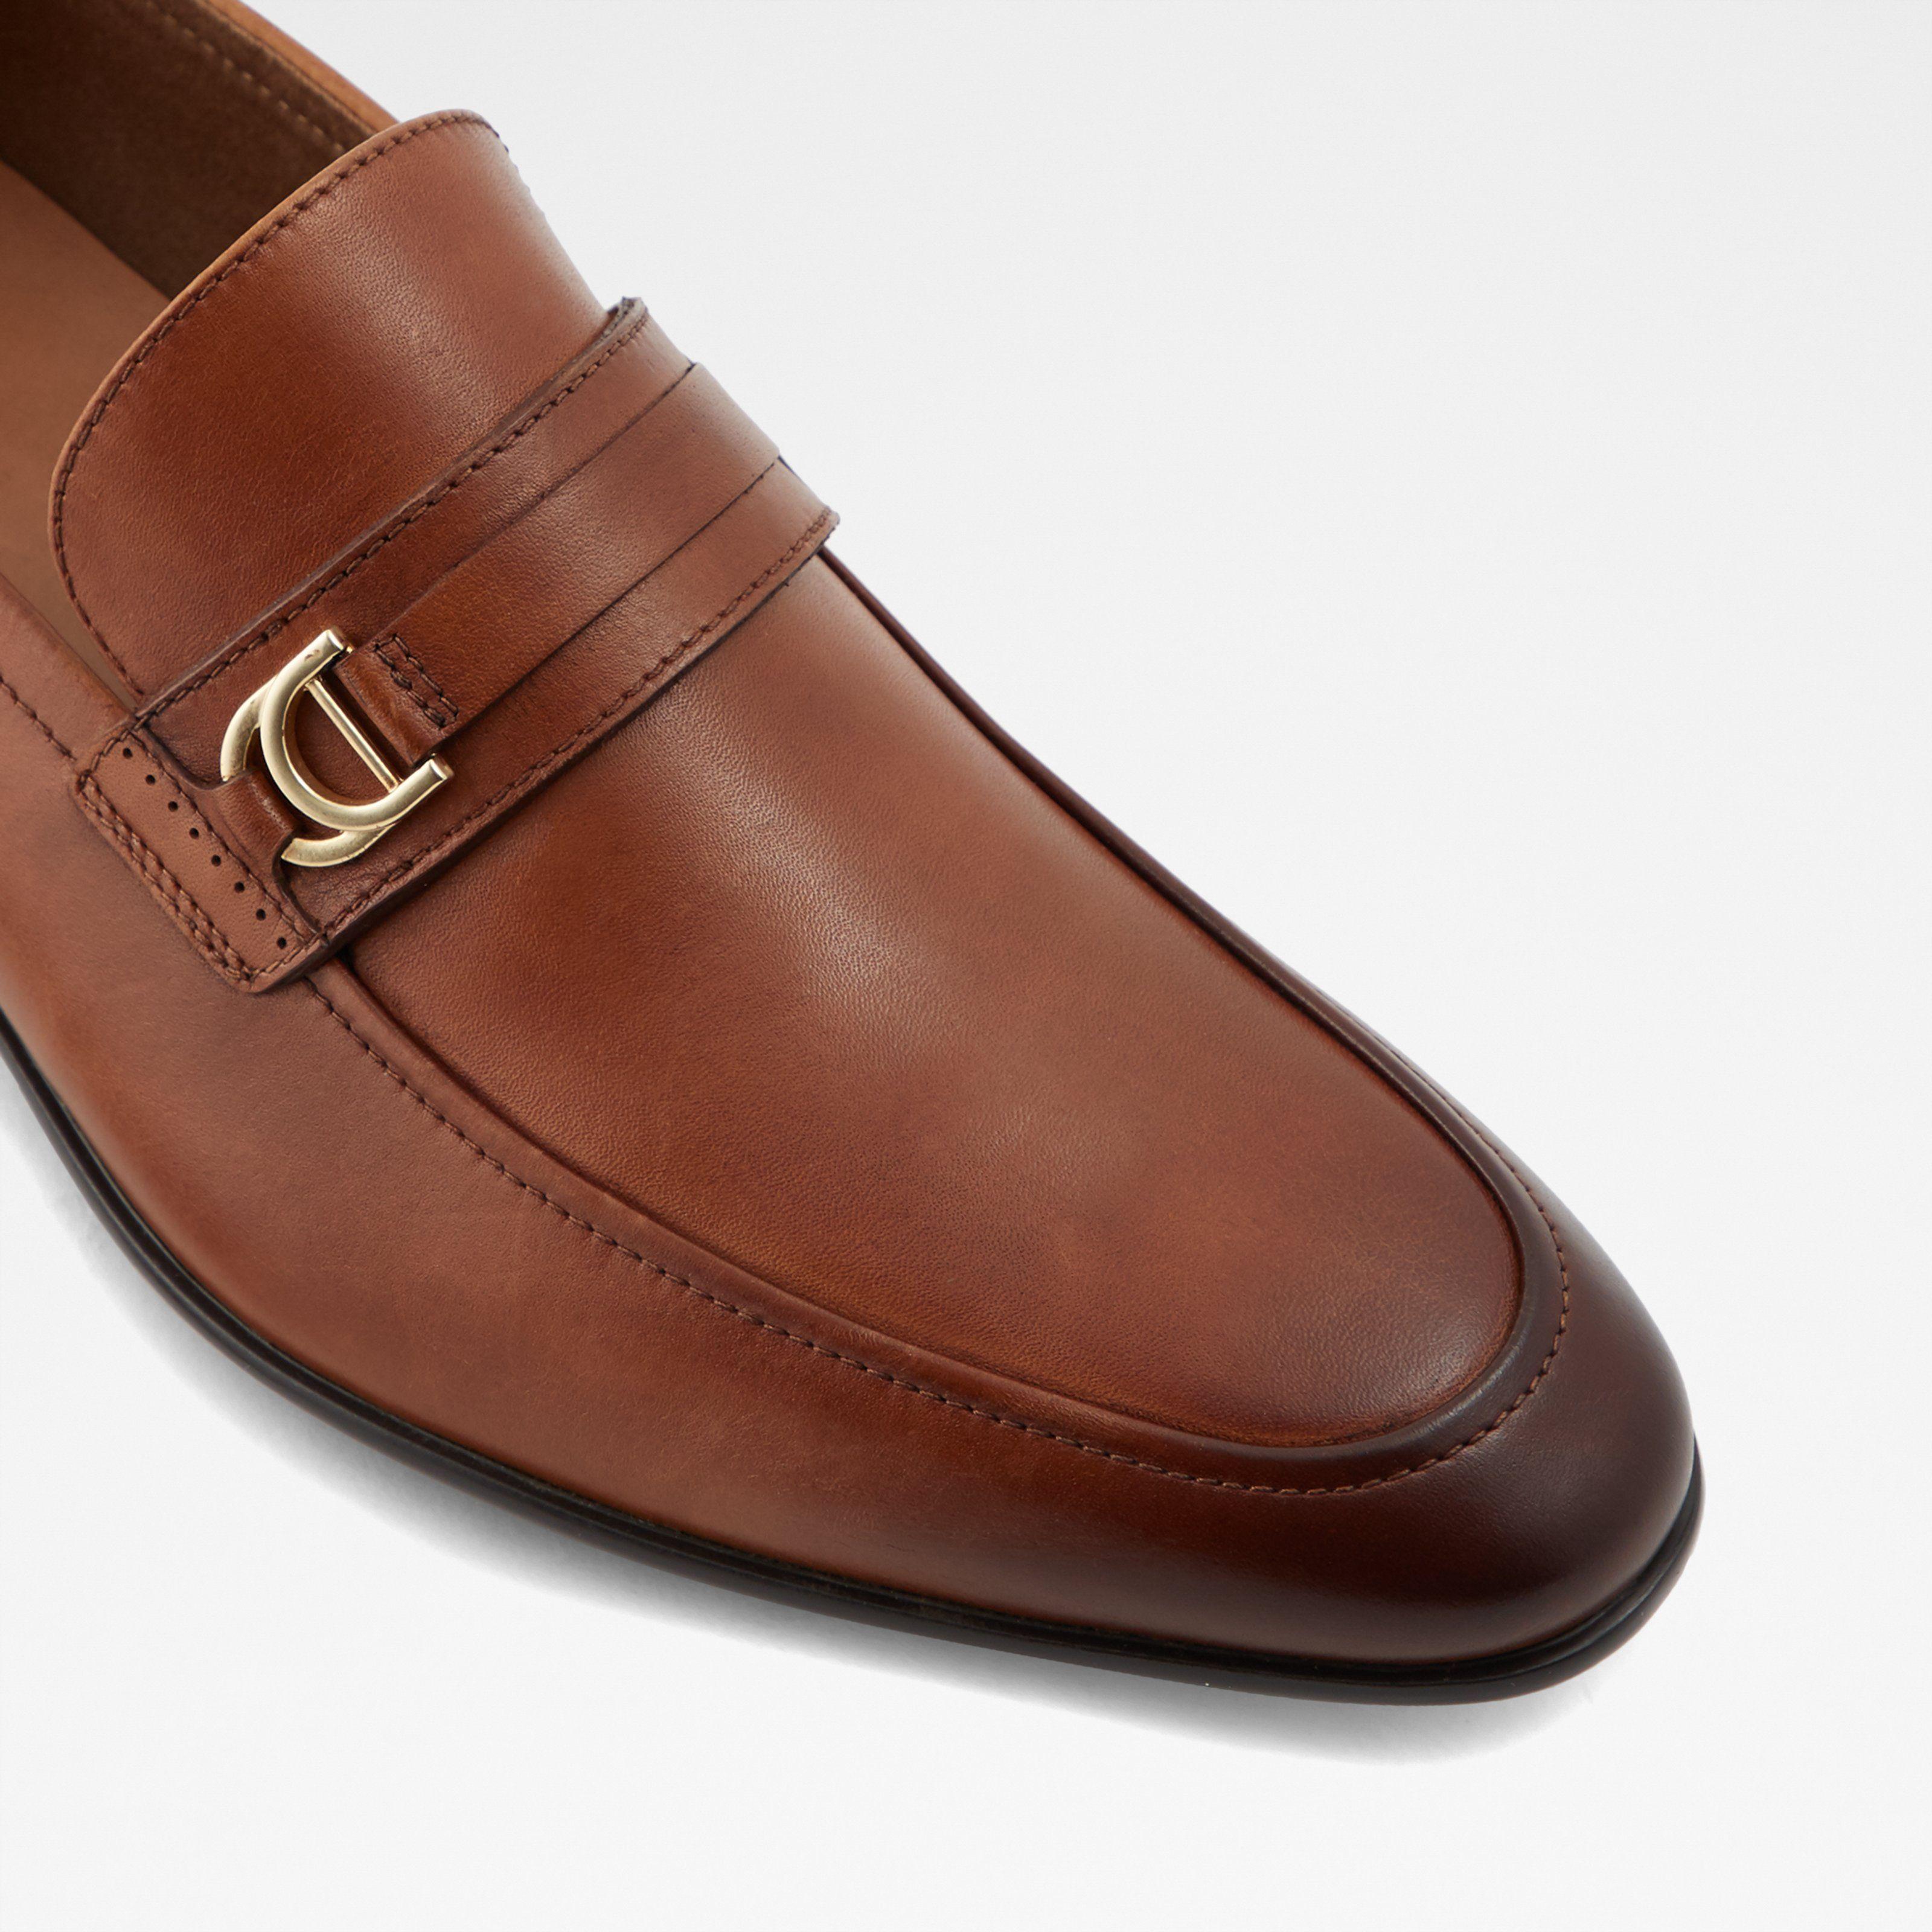 Dweang | Dress shoes men, Dress shoes